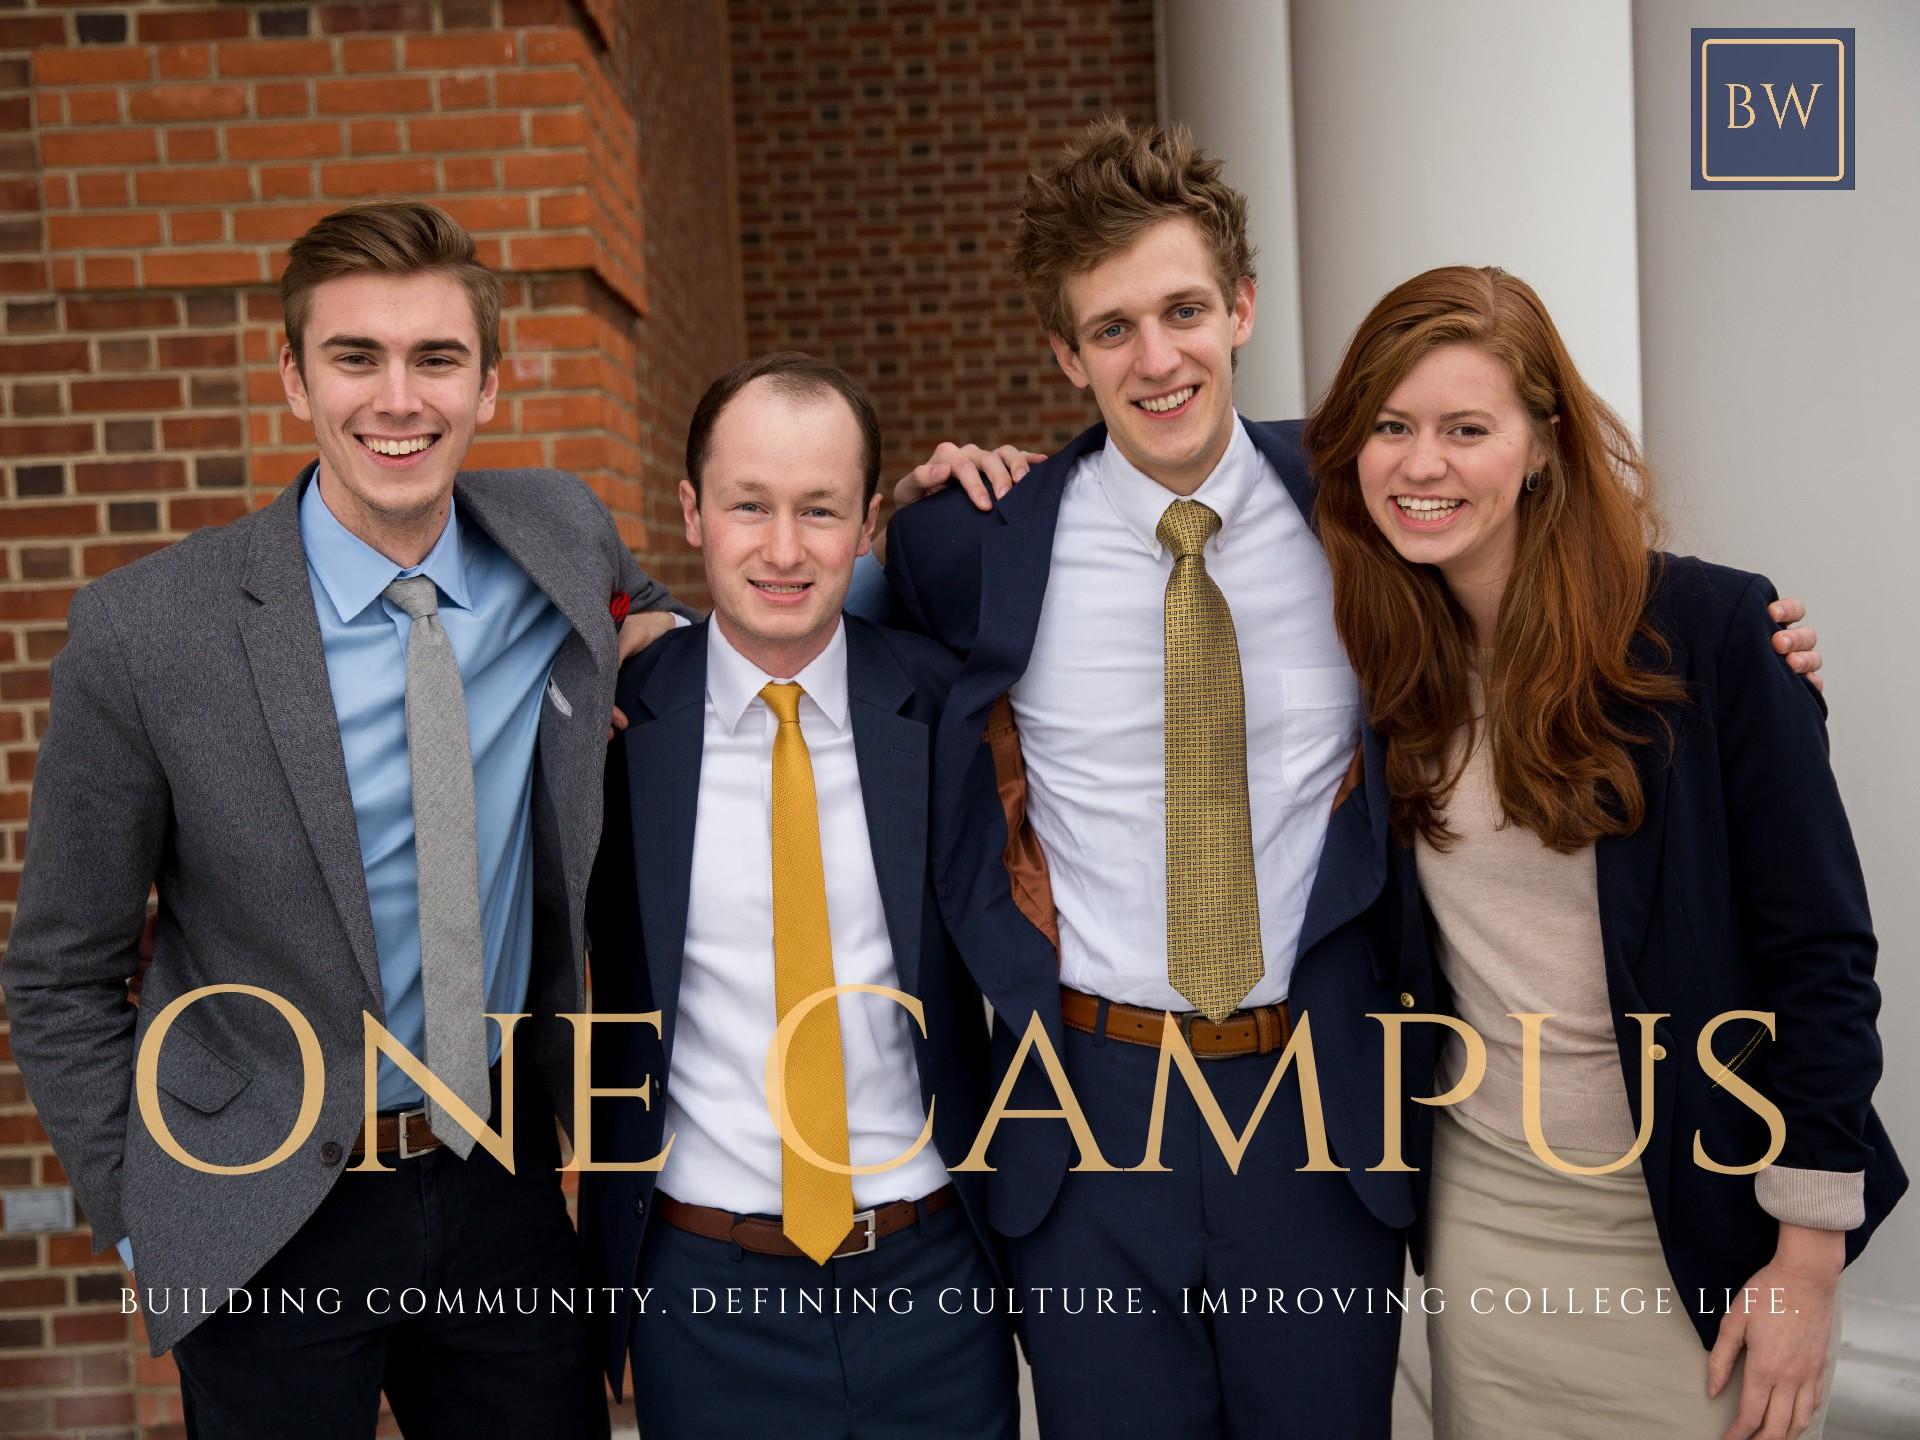 Patrick Henry College (PHC) students Shane Roberts, William Bock, Josh Webb, and Meridian Paulton